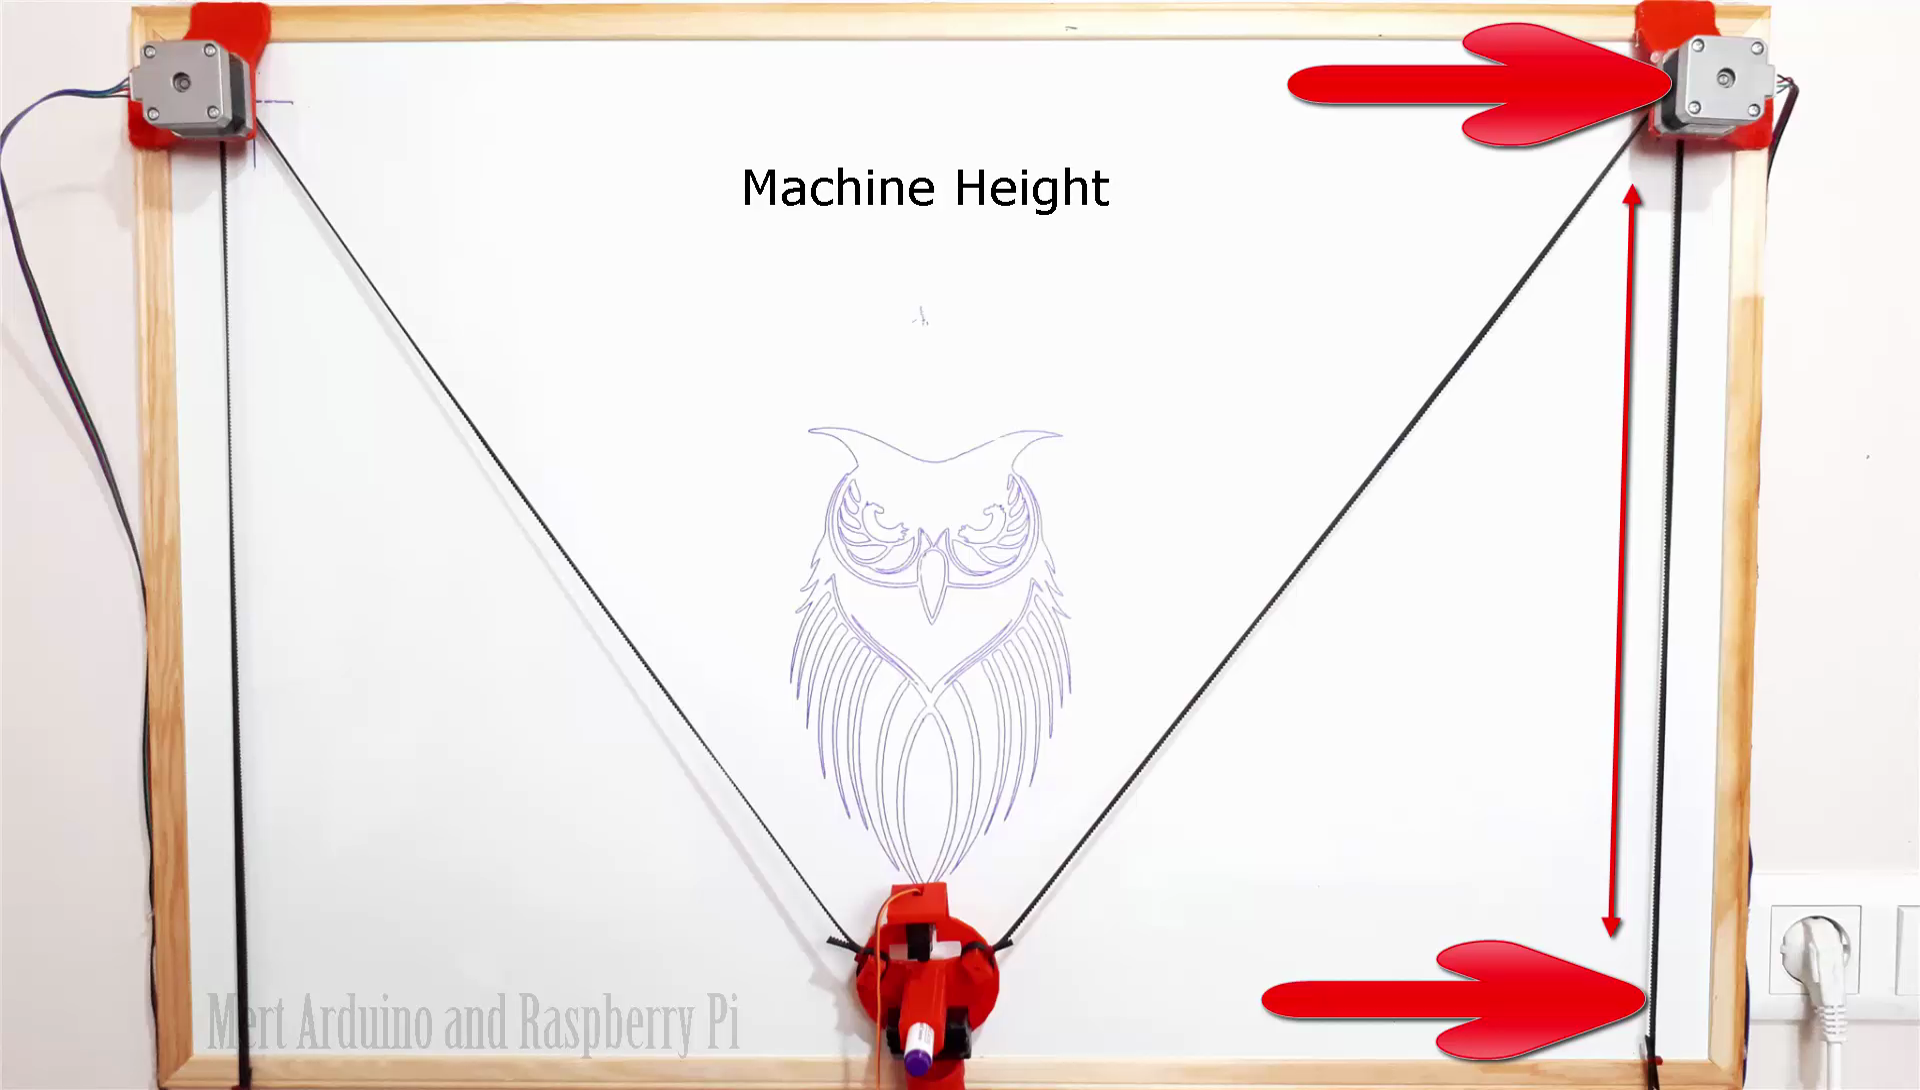 Picture of Machine Dimensions